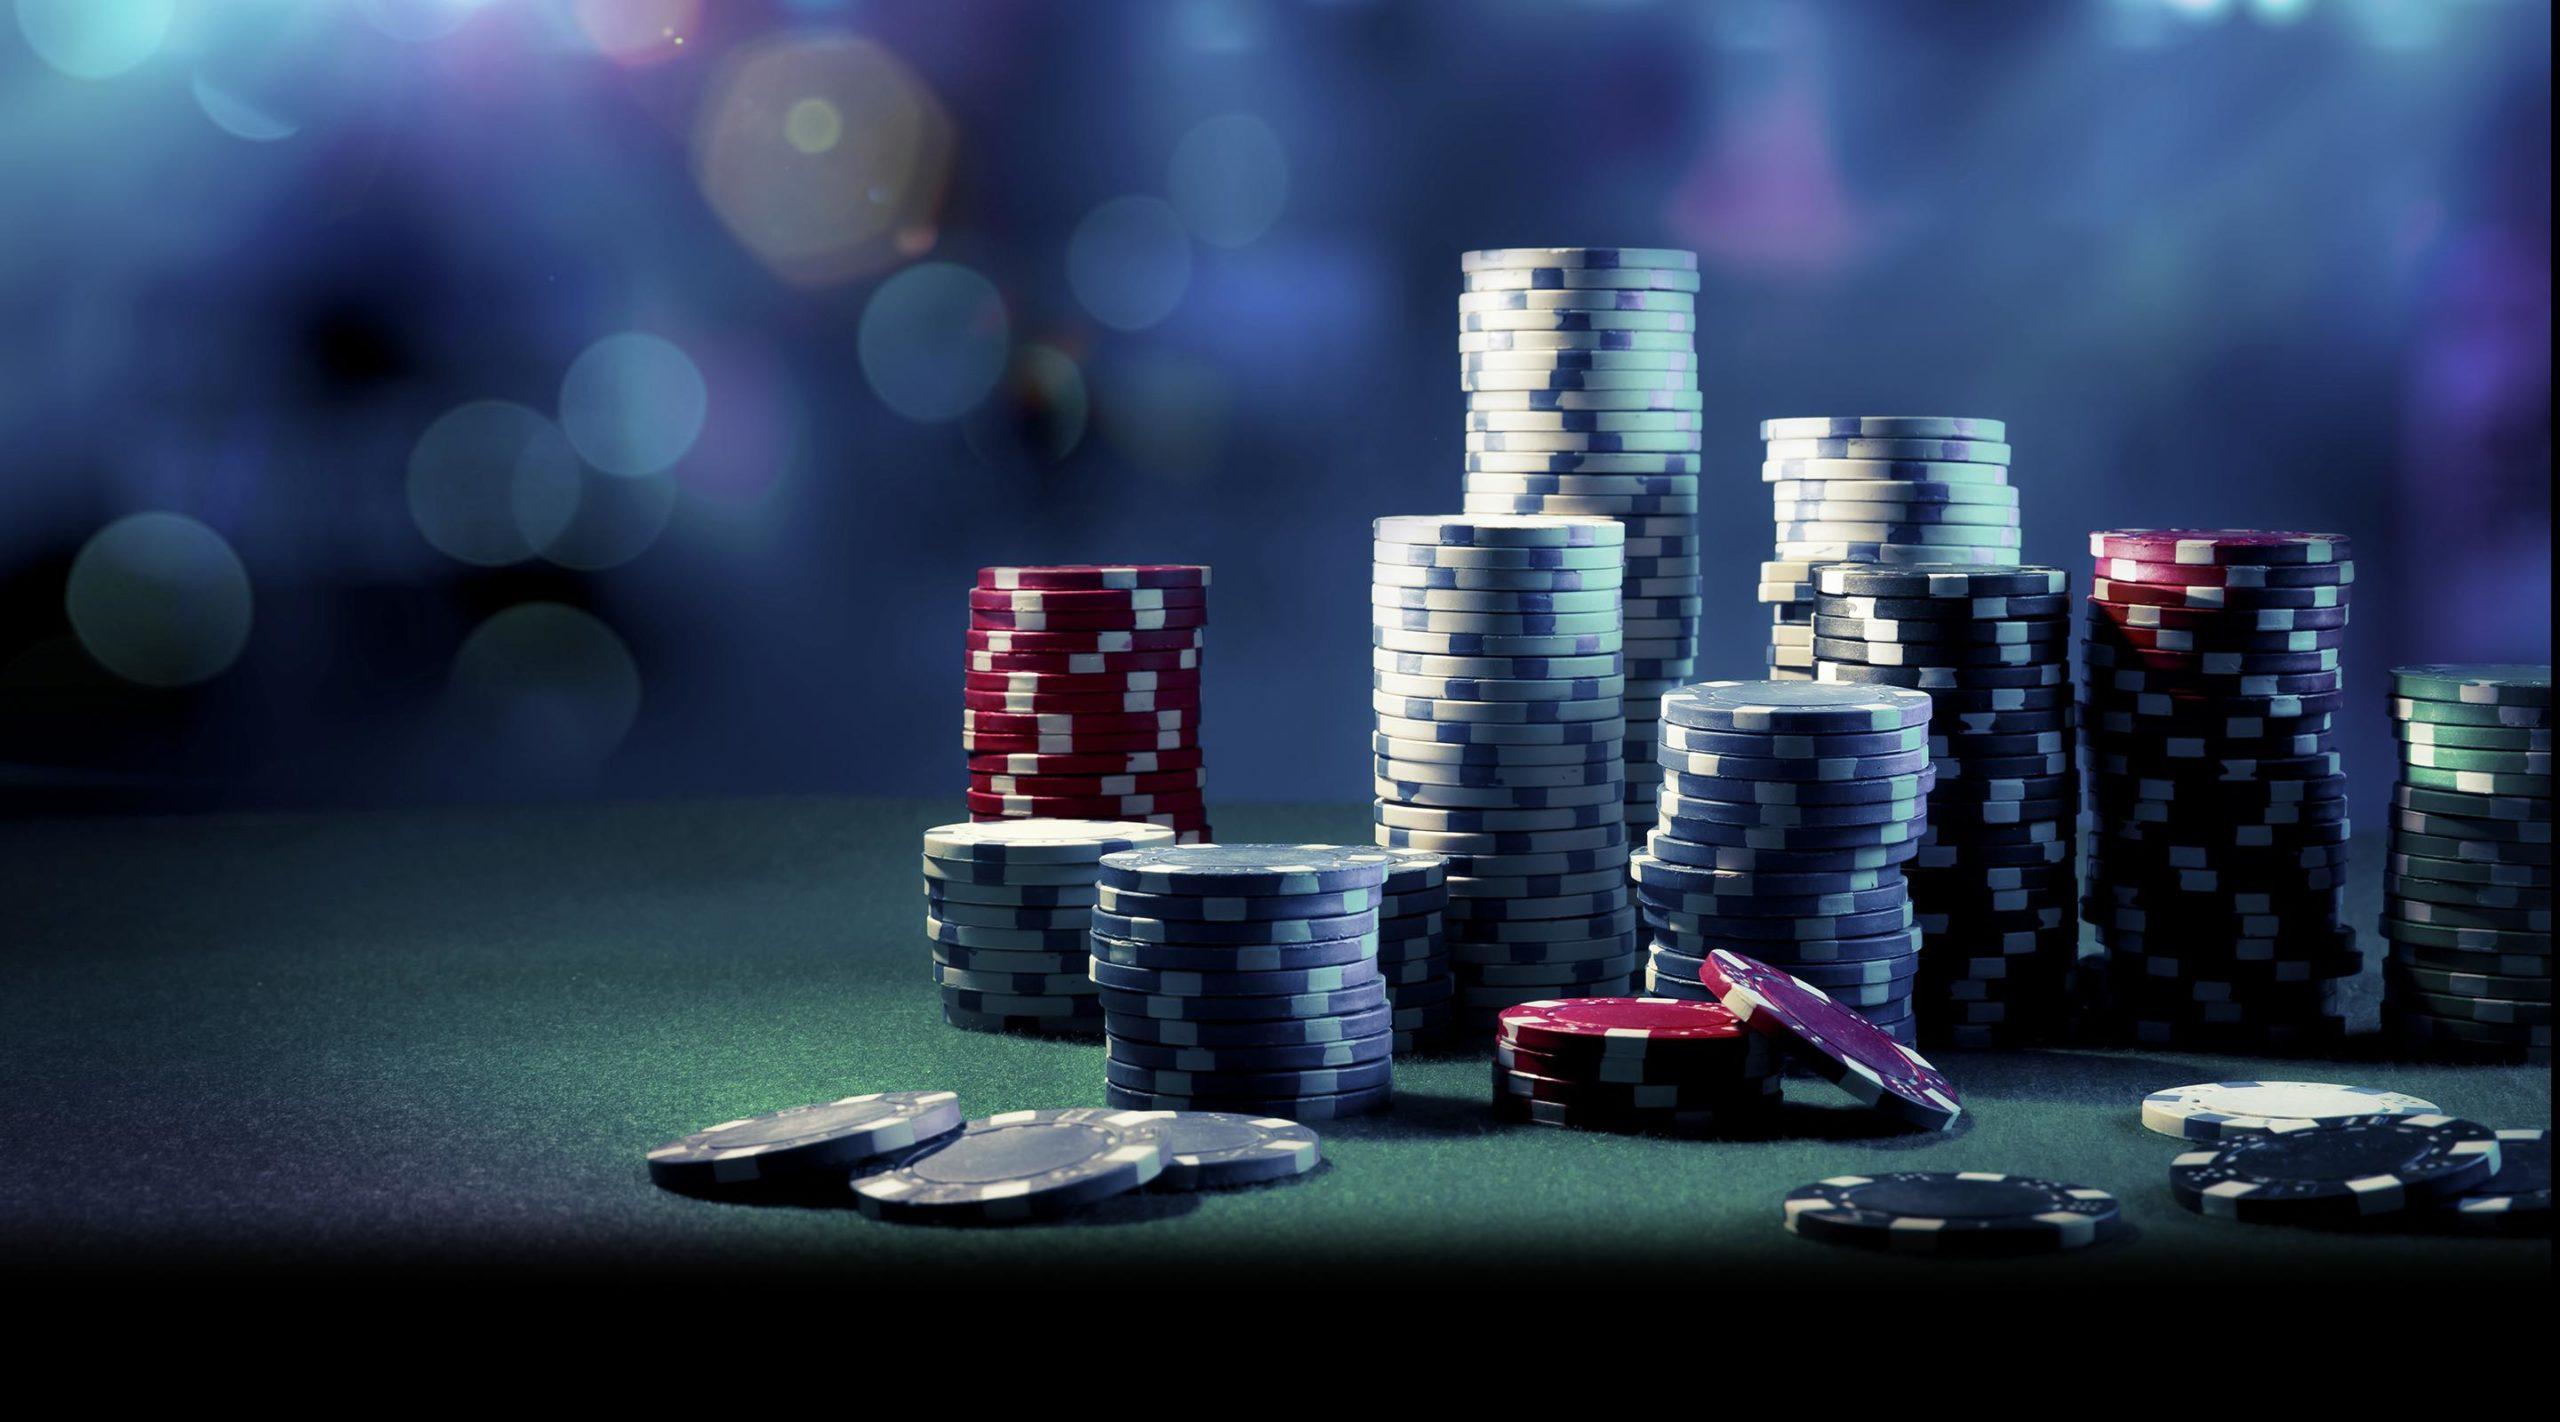 Appellate Court Rules in Favor of Online Poker Legislation